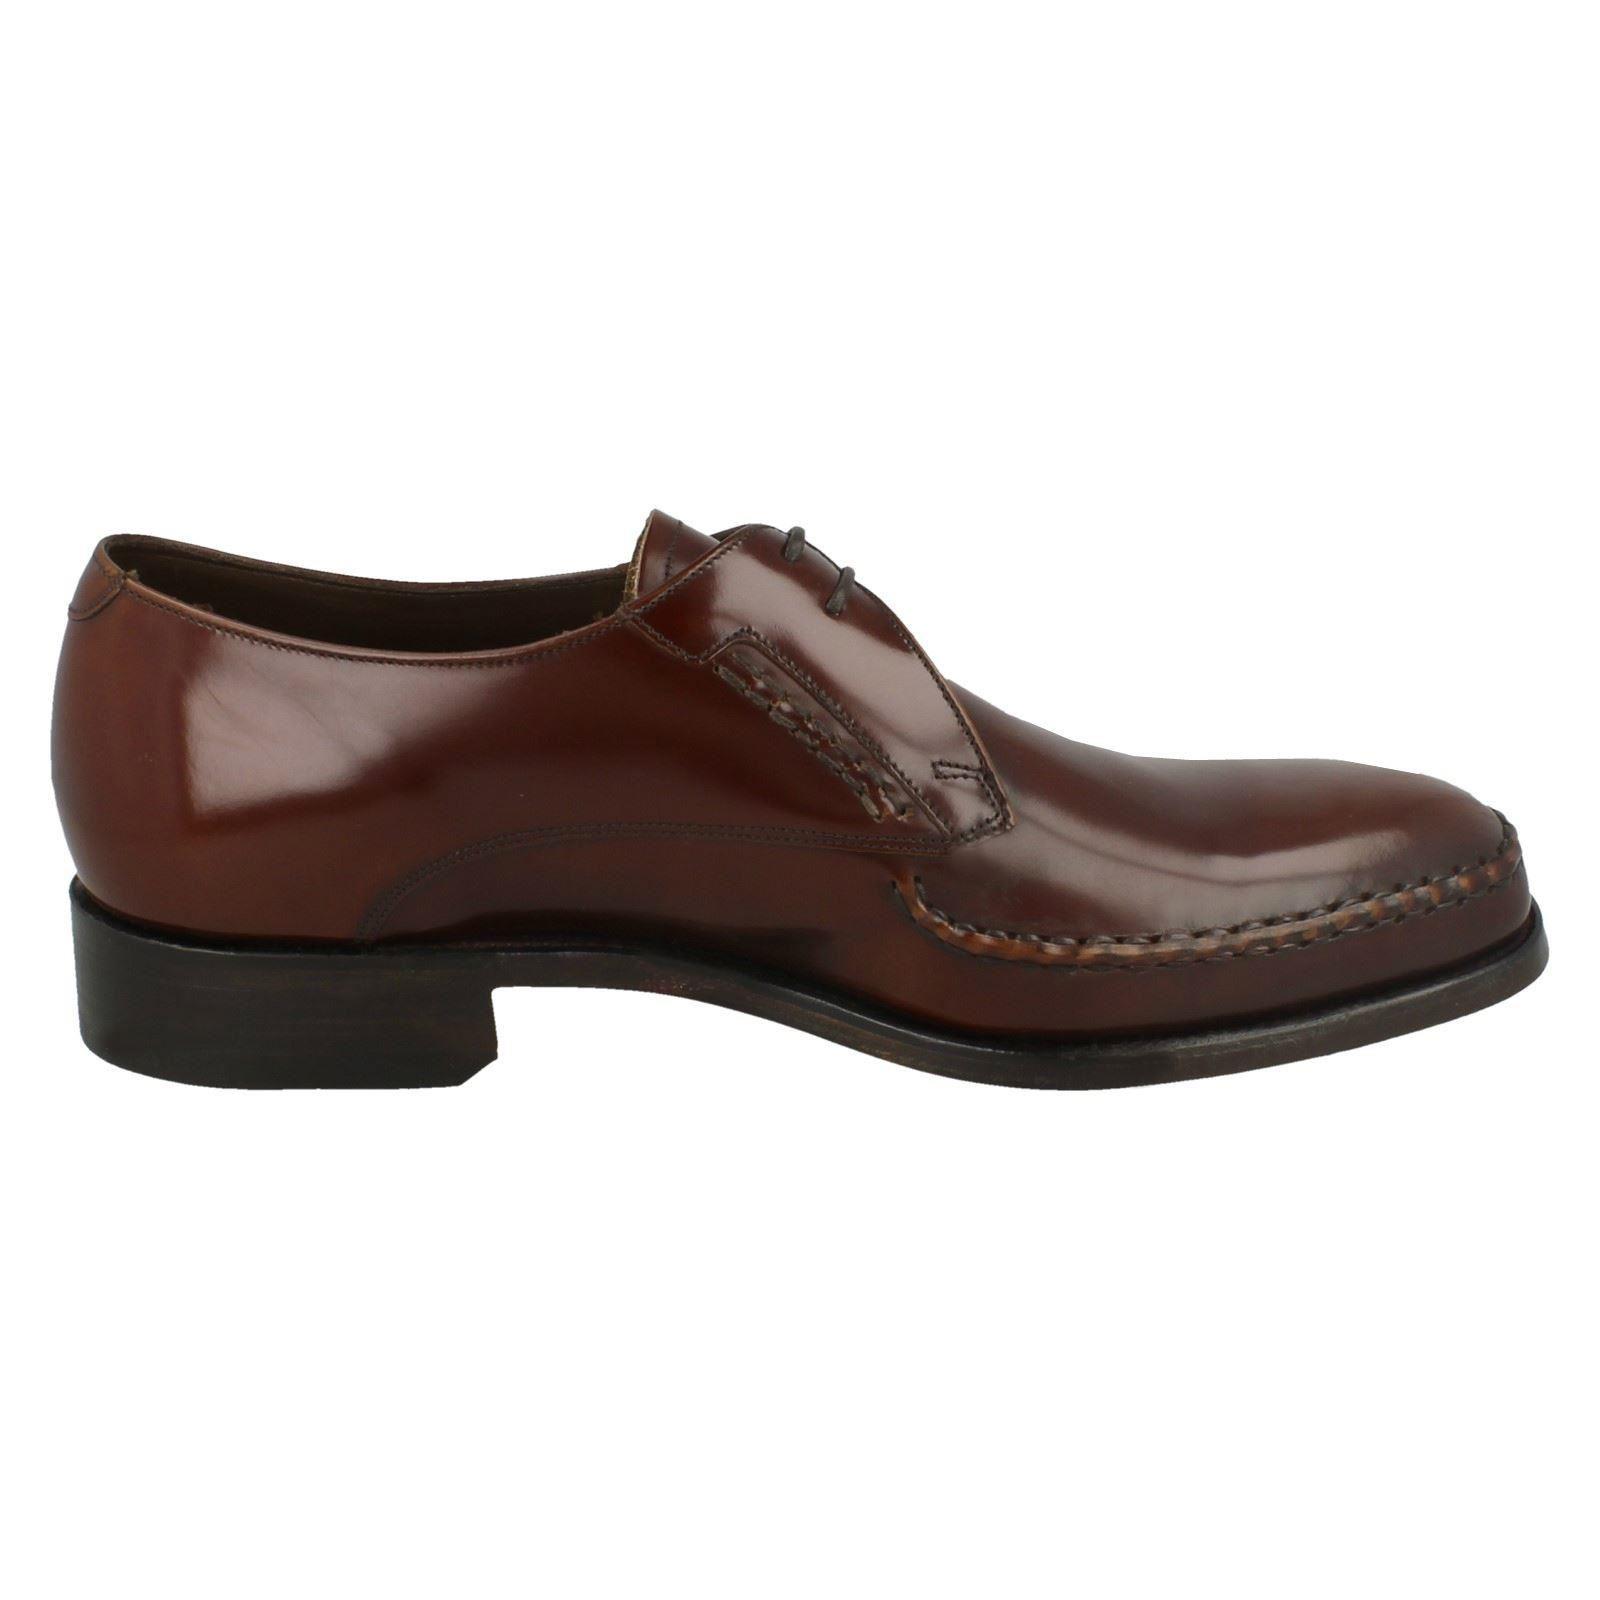 f7b5c23a Barker-Mens-Formal-Shoes-Pitney thumbnail 25